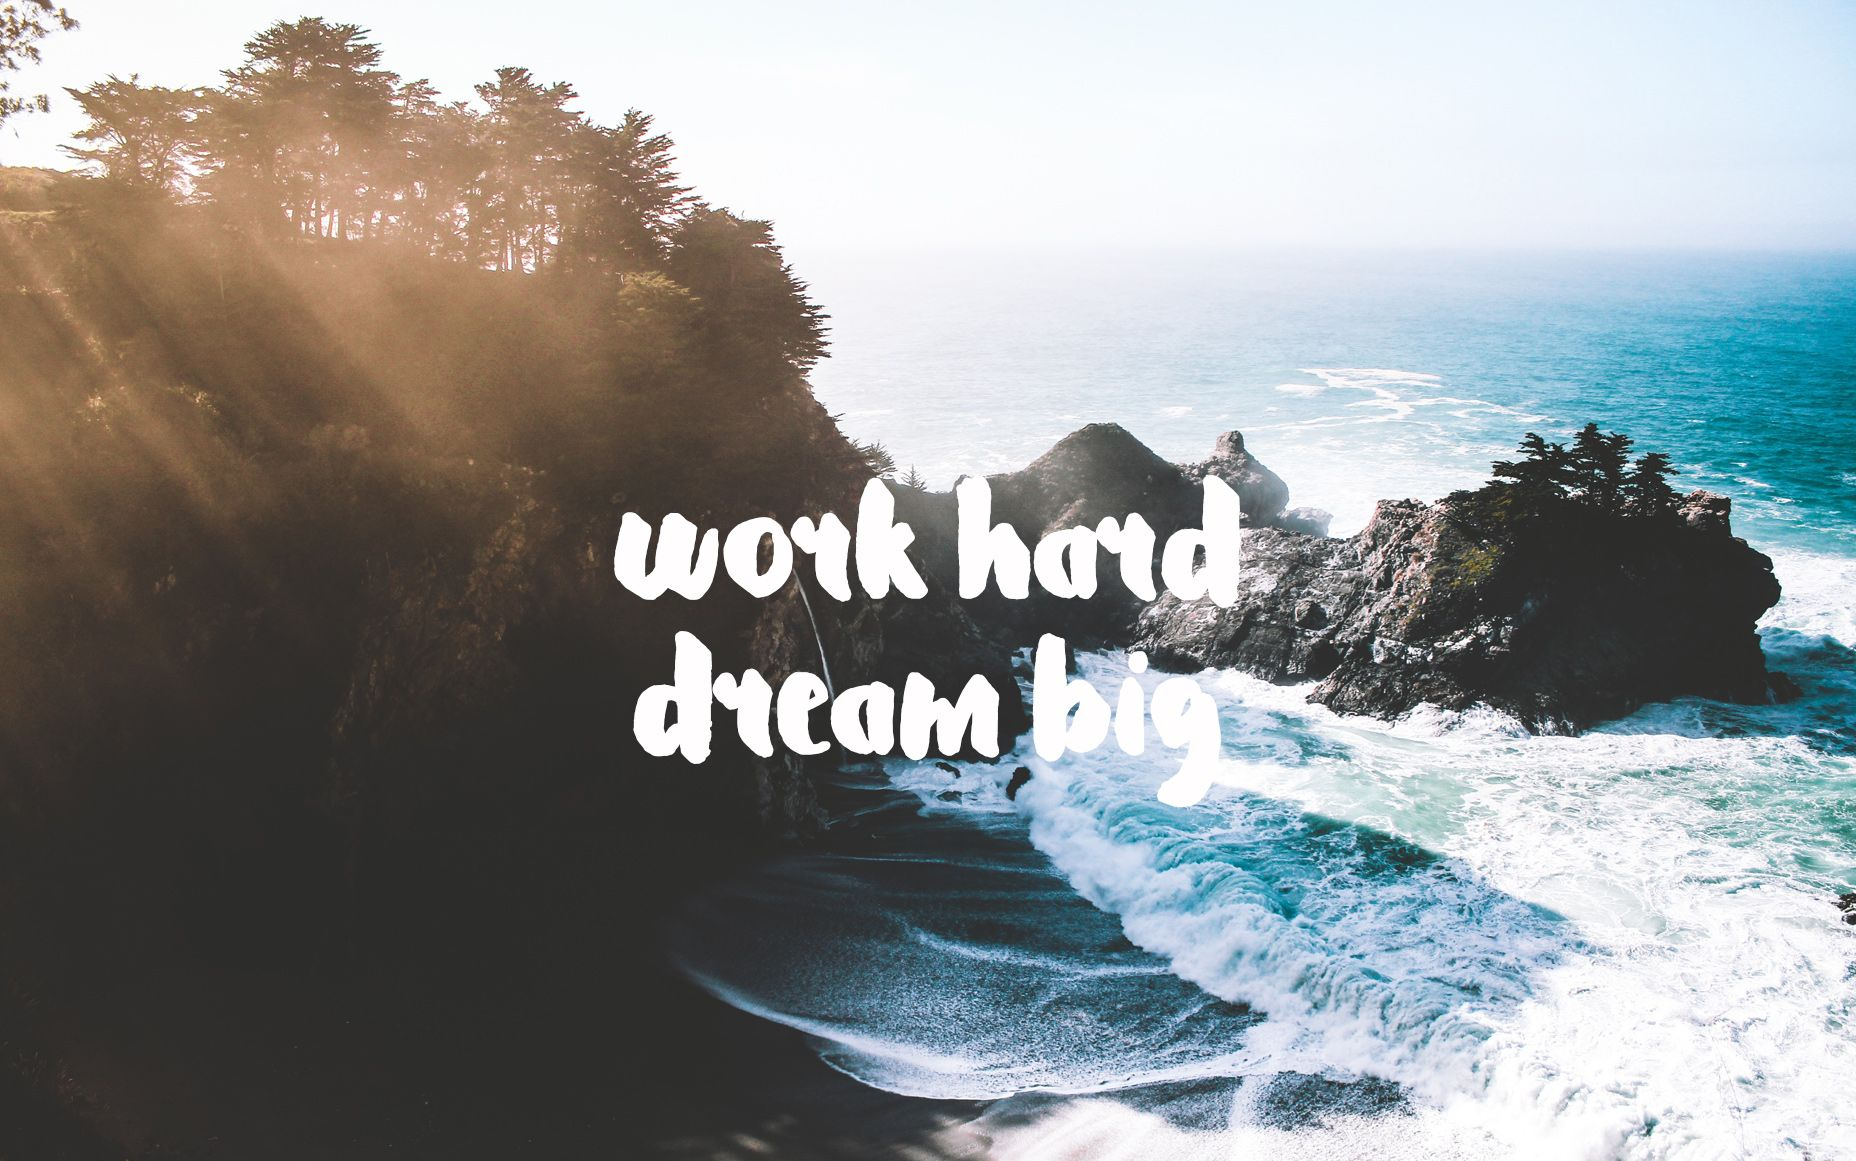 Work Sweat Achieve Motivational Wallpaper For Desktop QuotationWalls 500x707 Hard 28 Wallpapers